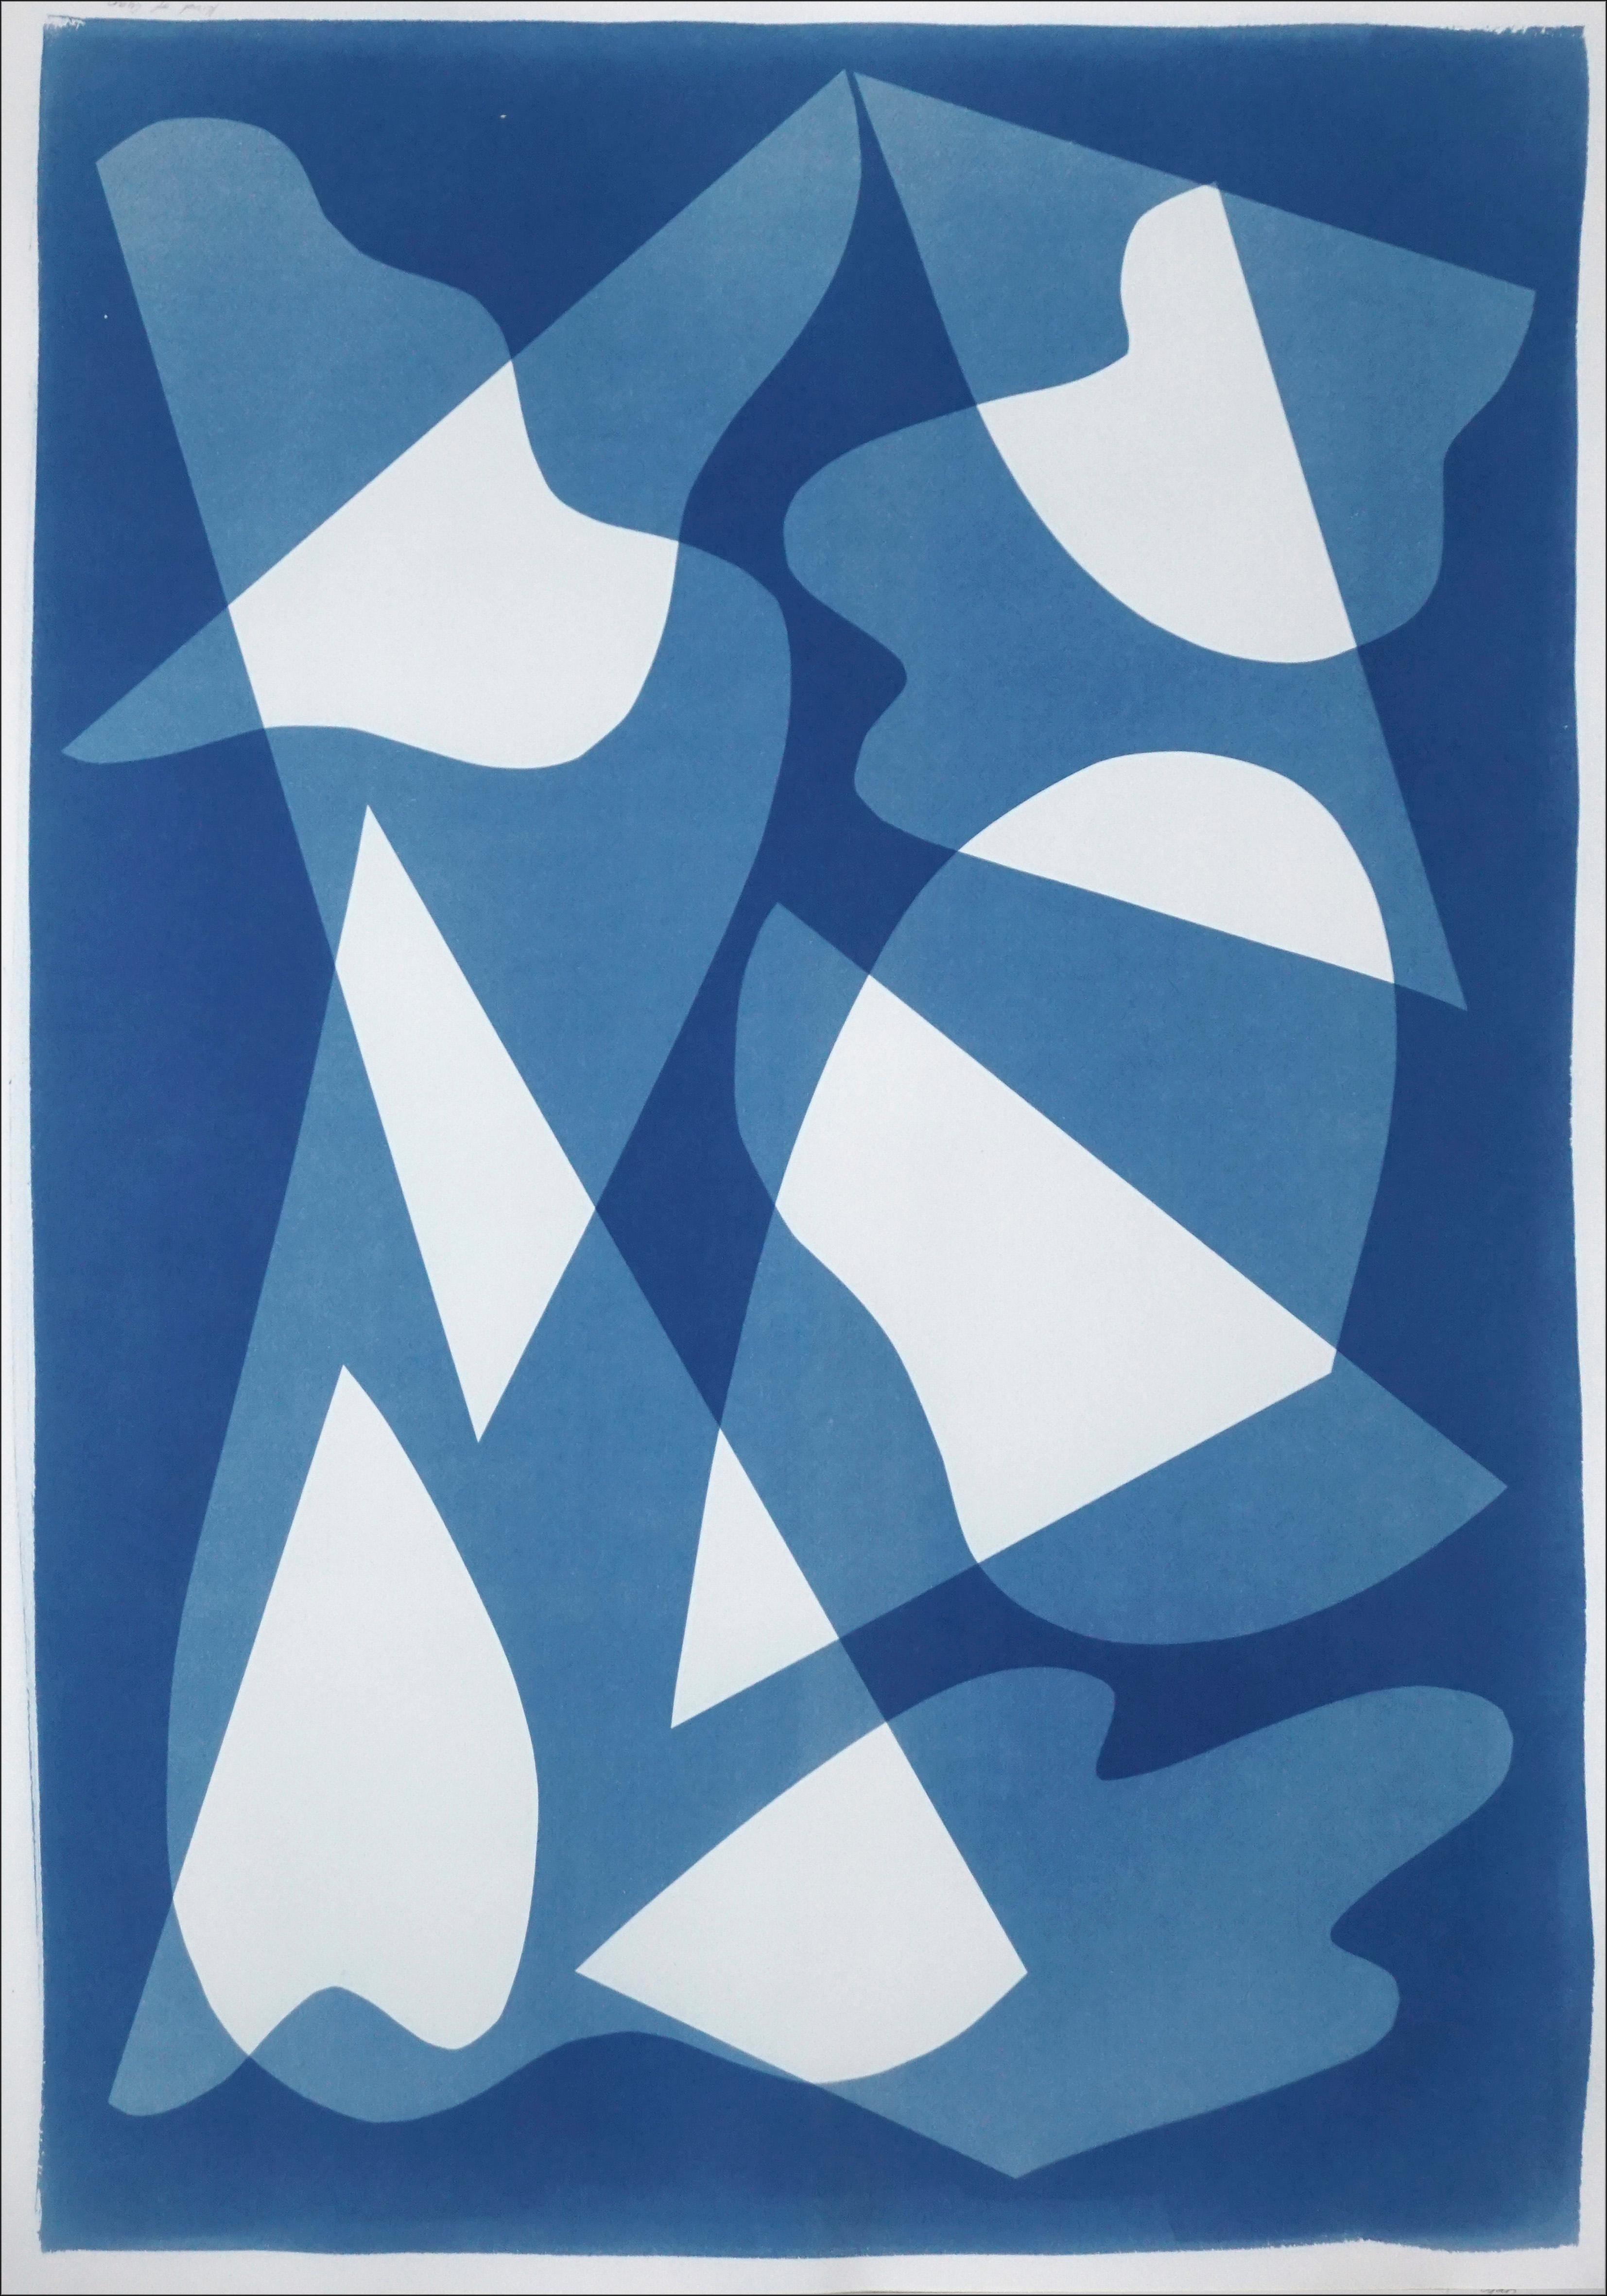 Mirrors Under Water, Handmade Unique Monotype Cyanotype on Blue Tones, Paper